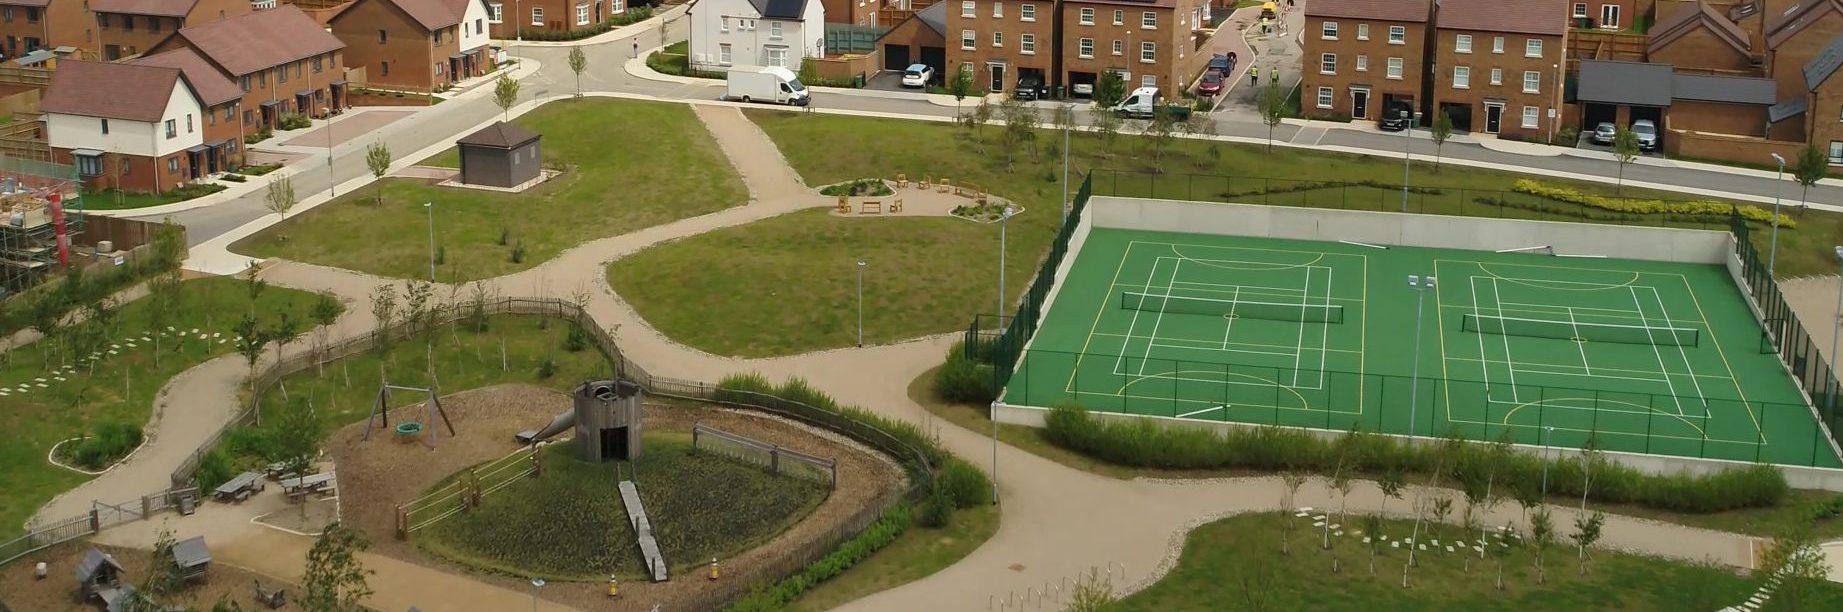 Castle Hill tennis courts